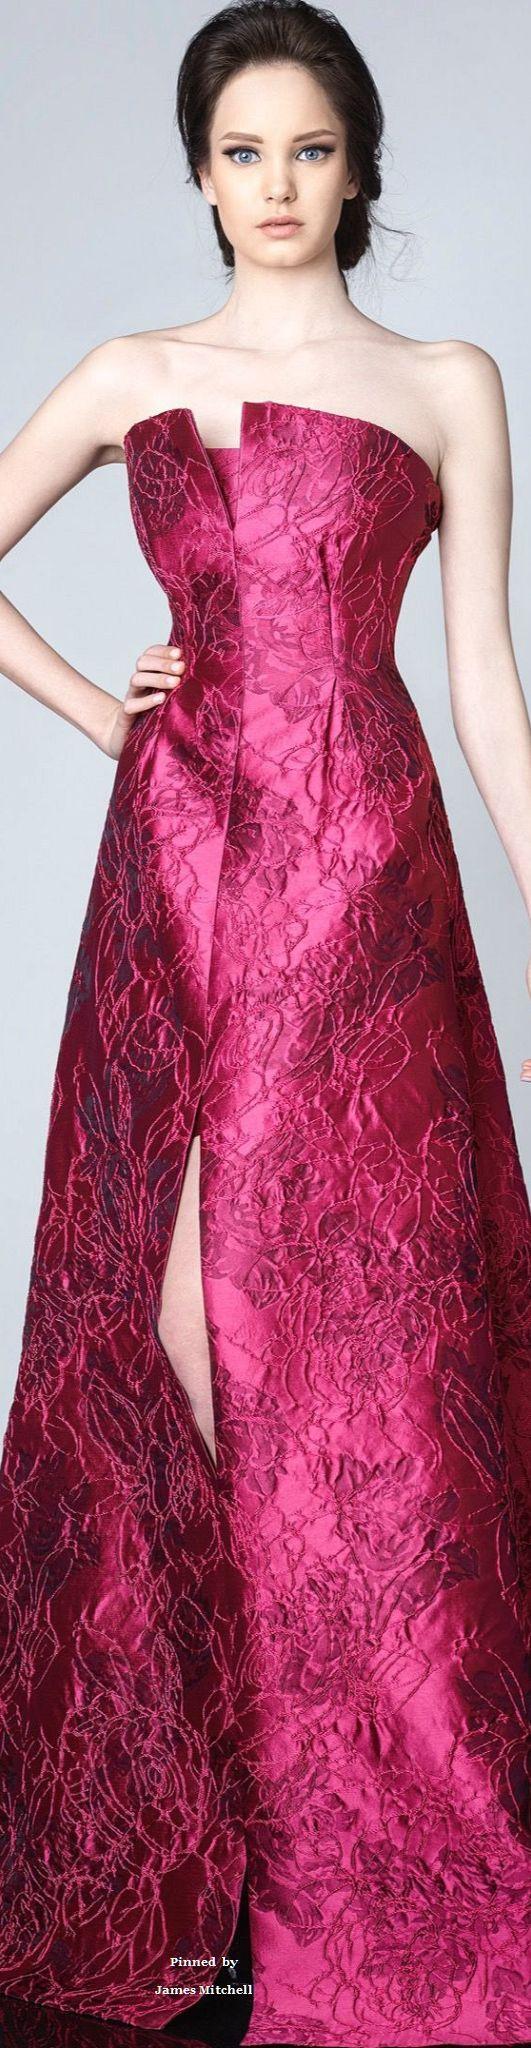 Mejores 810 imágenes de Pink / Blush / Nude en Pinterest | Alta ...